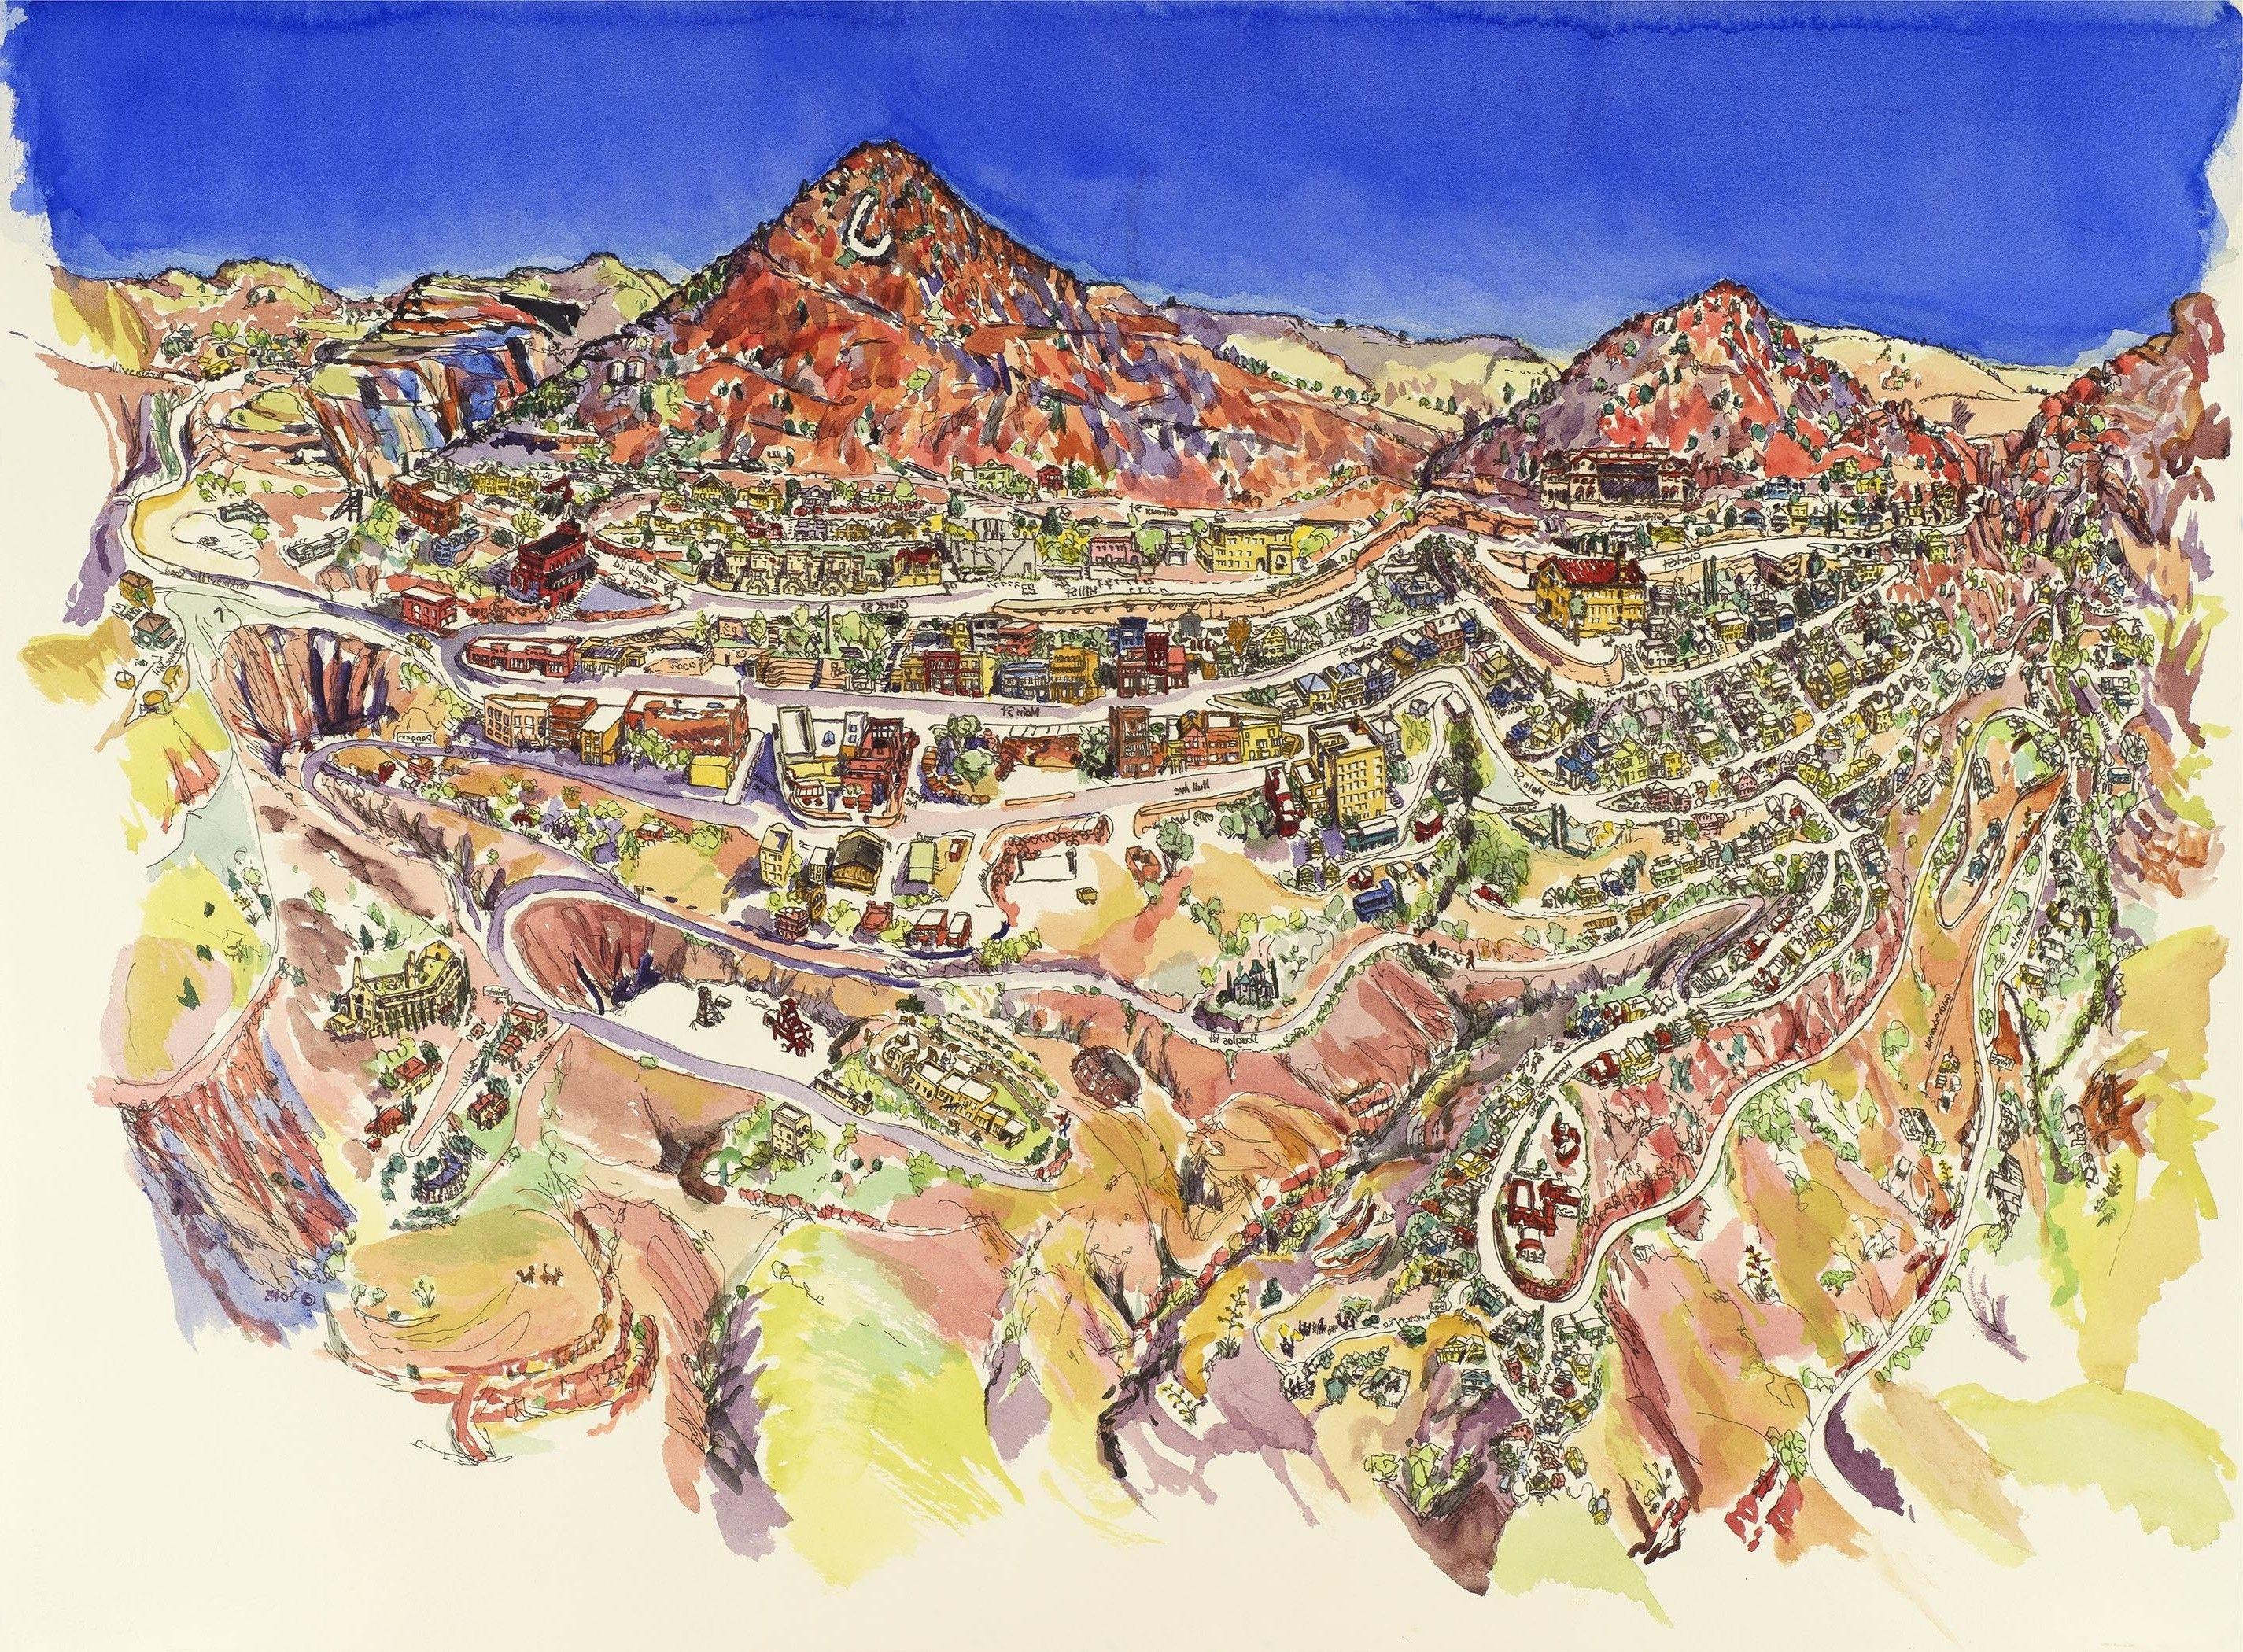 Map Of Arizona Including Jerome.Jerome Az Map My Blog With Arizona Az Places Arizona Road Trip